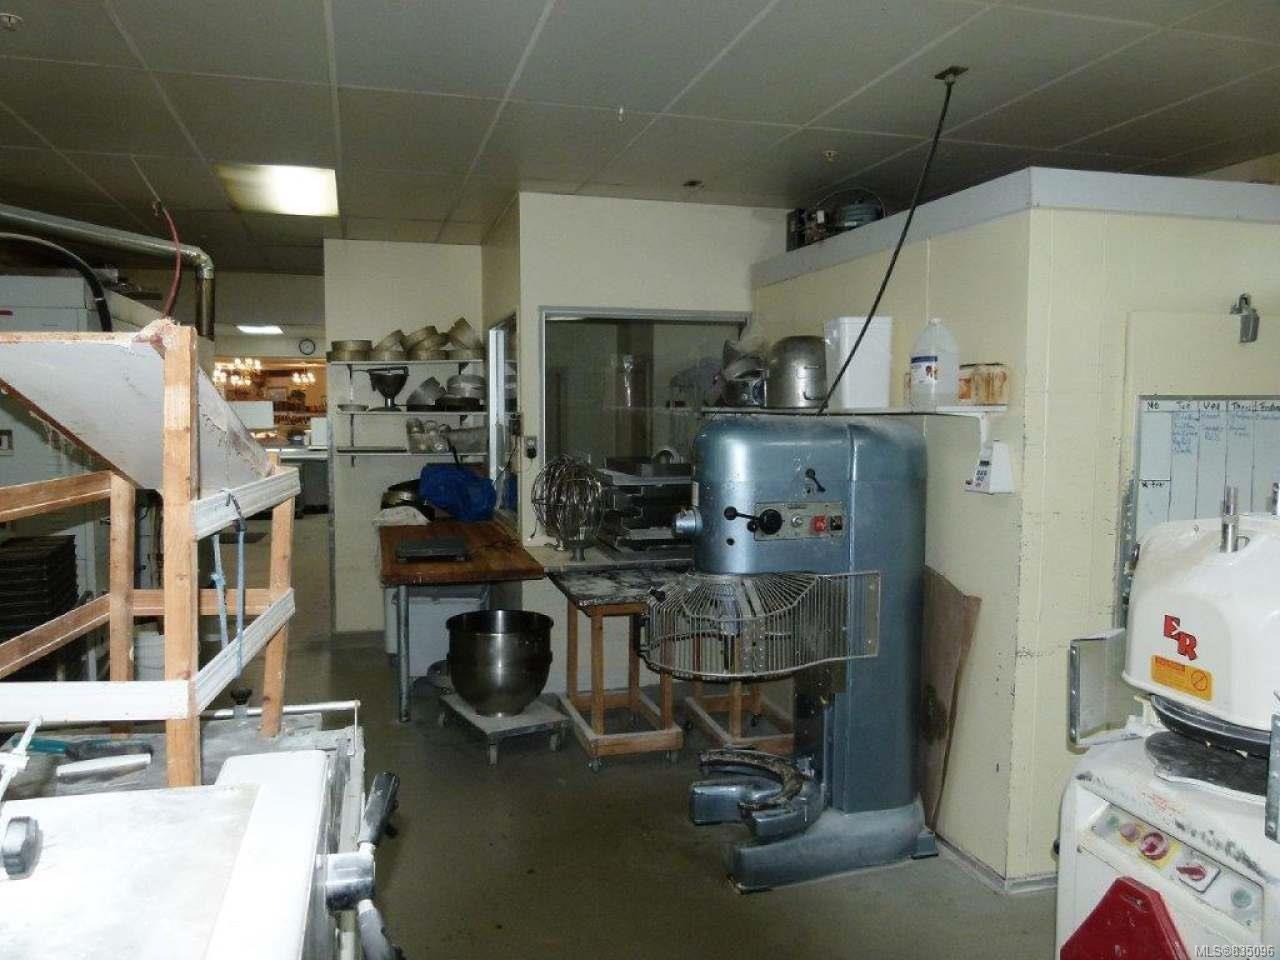 Photo 31: Photos: 2025 Bowen Rd in NANAIMO: Na Central Nanaimo Mixed Use for sale (Nanaimo)  : MLS®# 835096